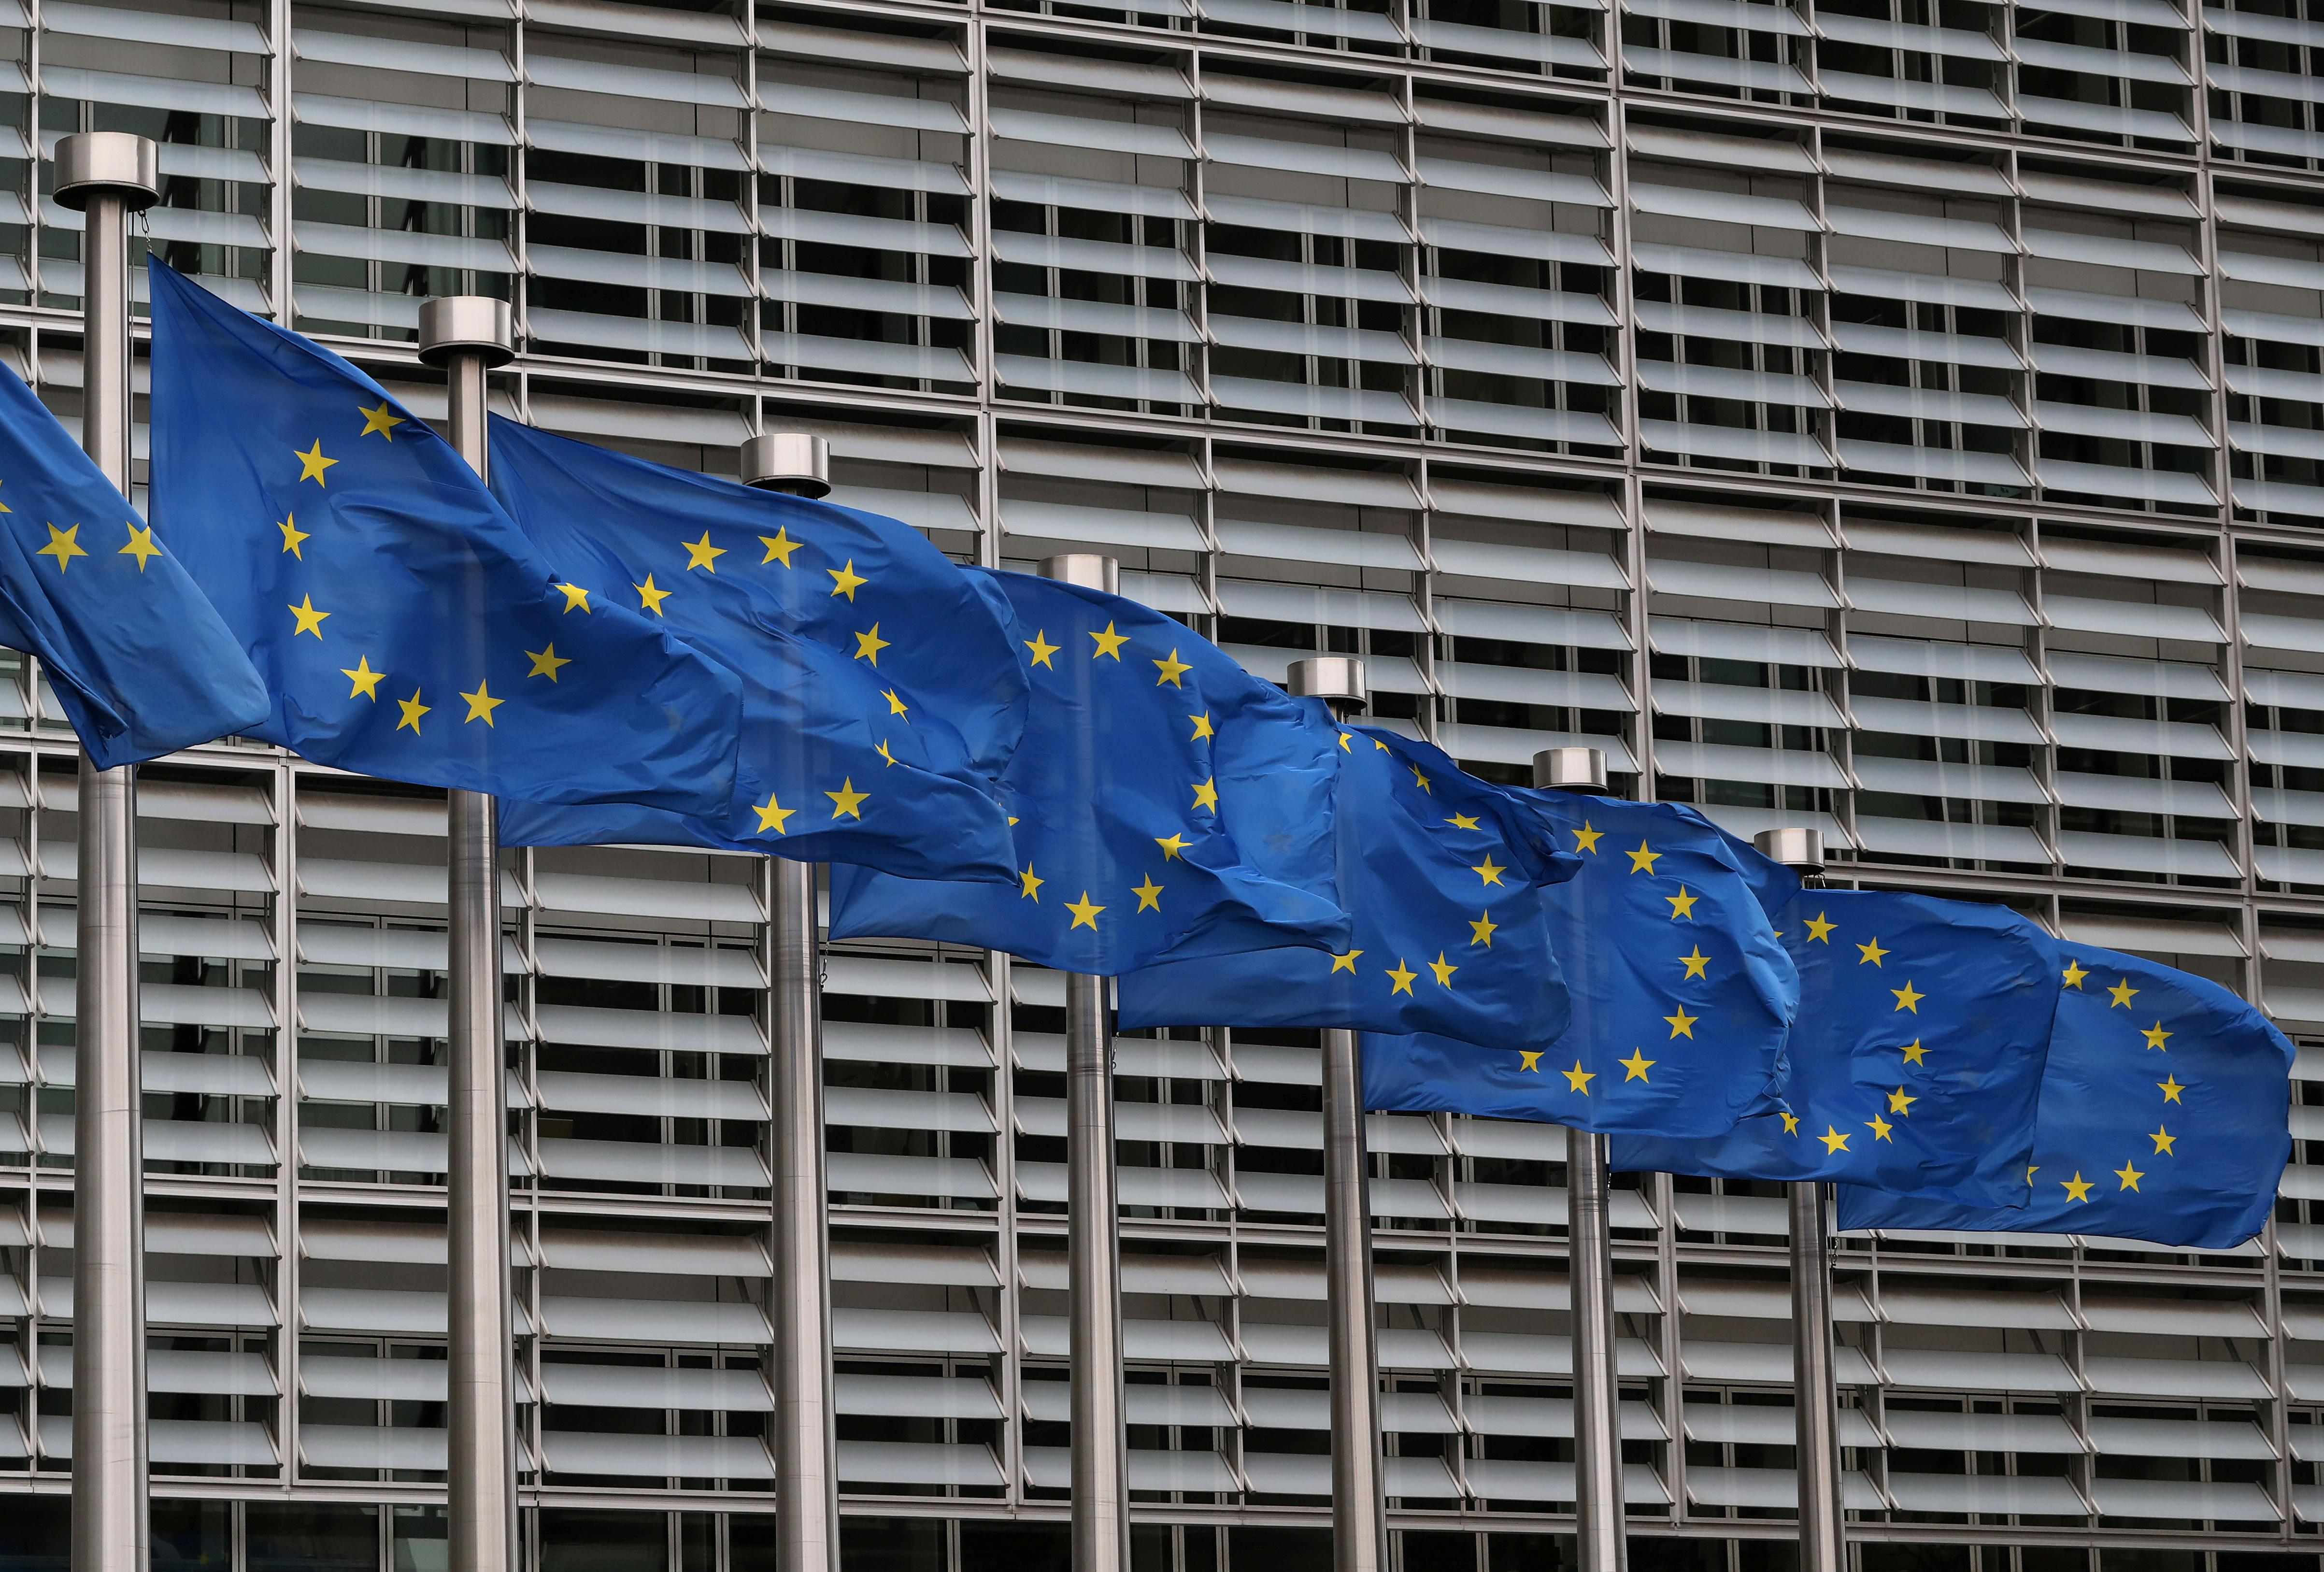 Cyprus, Malta lead EU ranking of $1.6 trillion assets held offshore